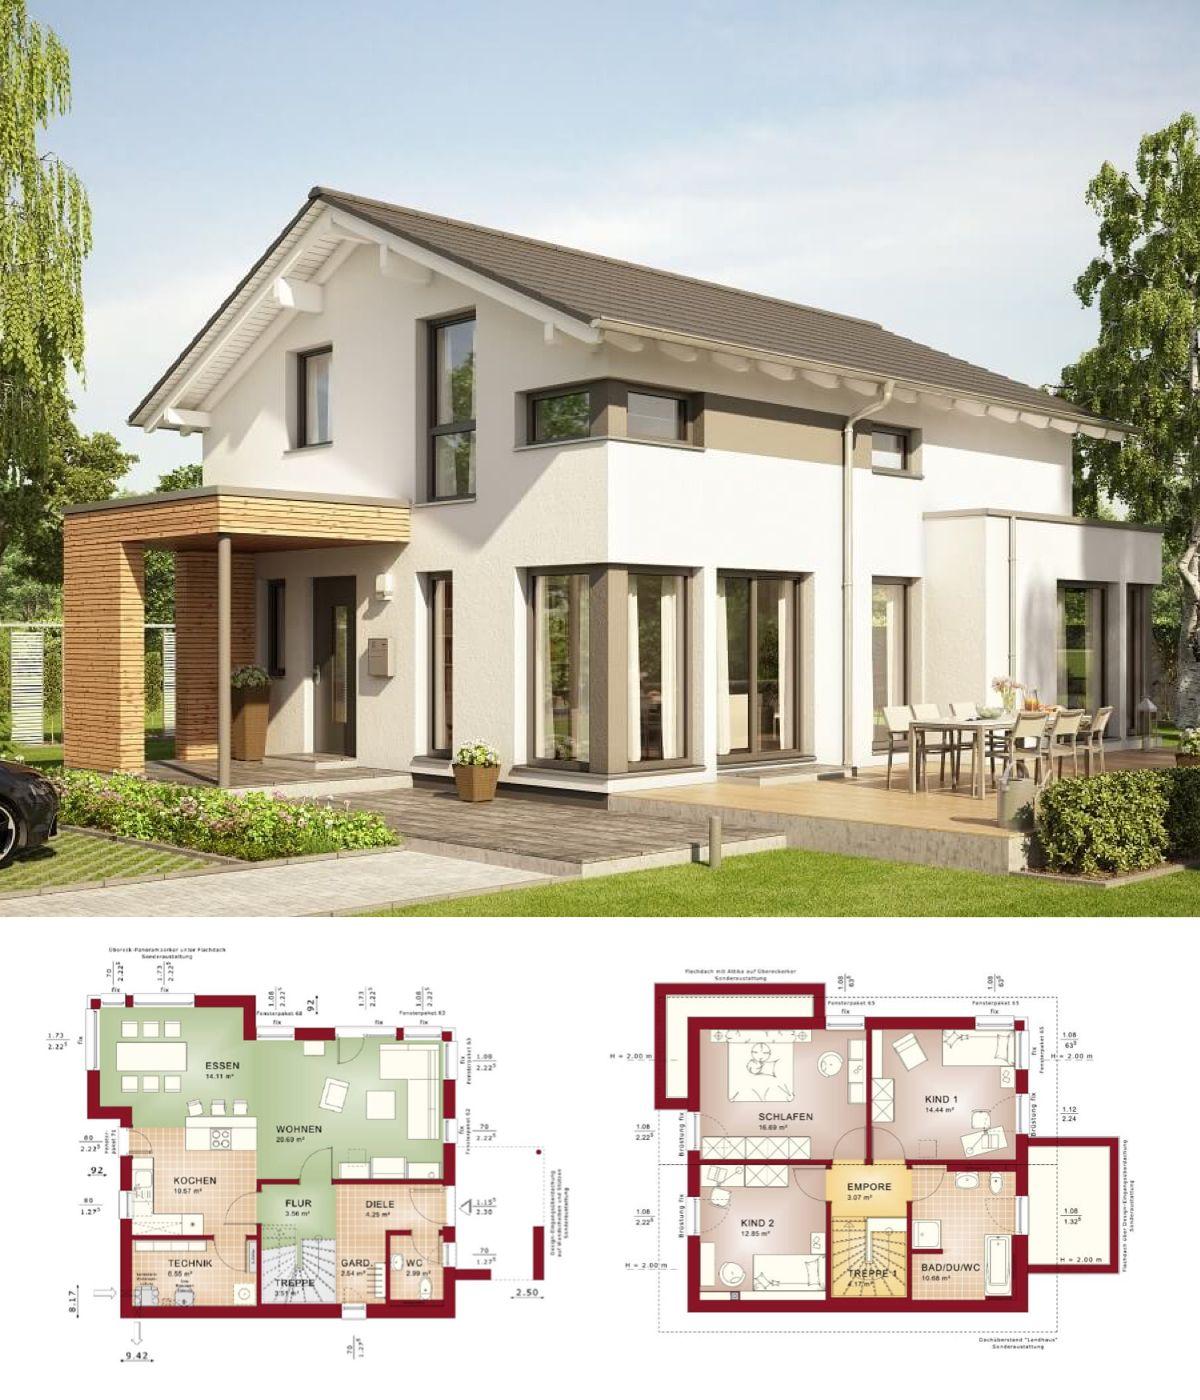 EINFAMILIENHAUS modern - Haus Edition 1 V3 Bien Zenker ...